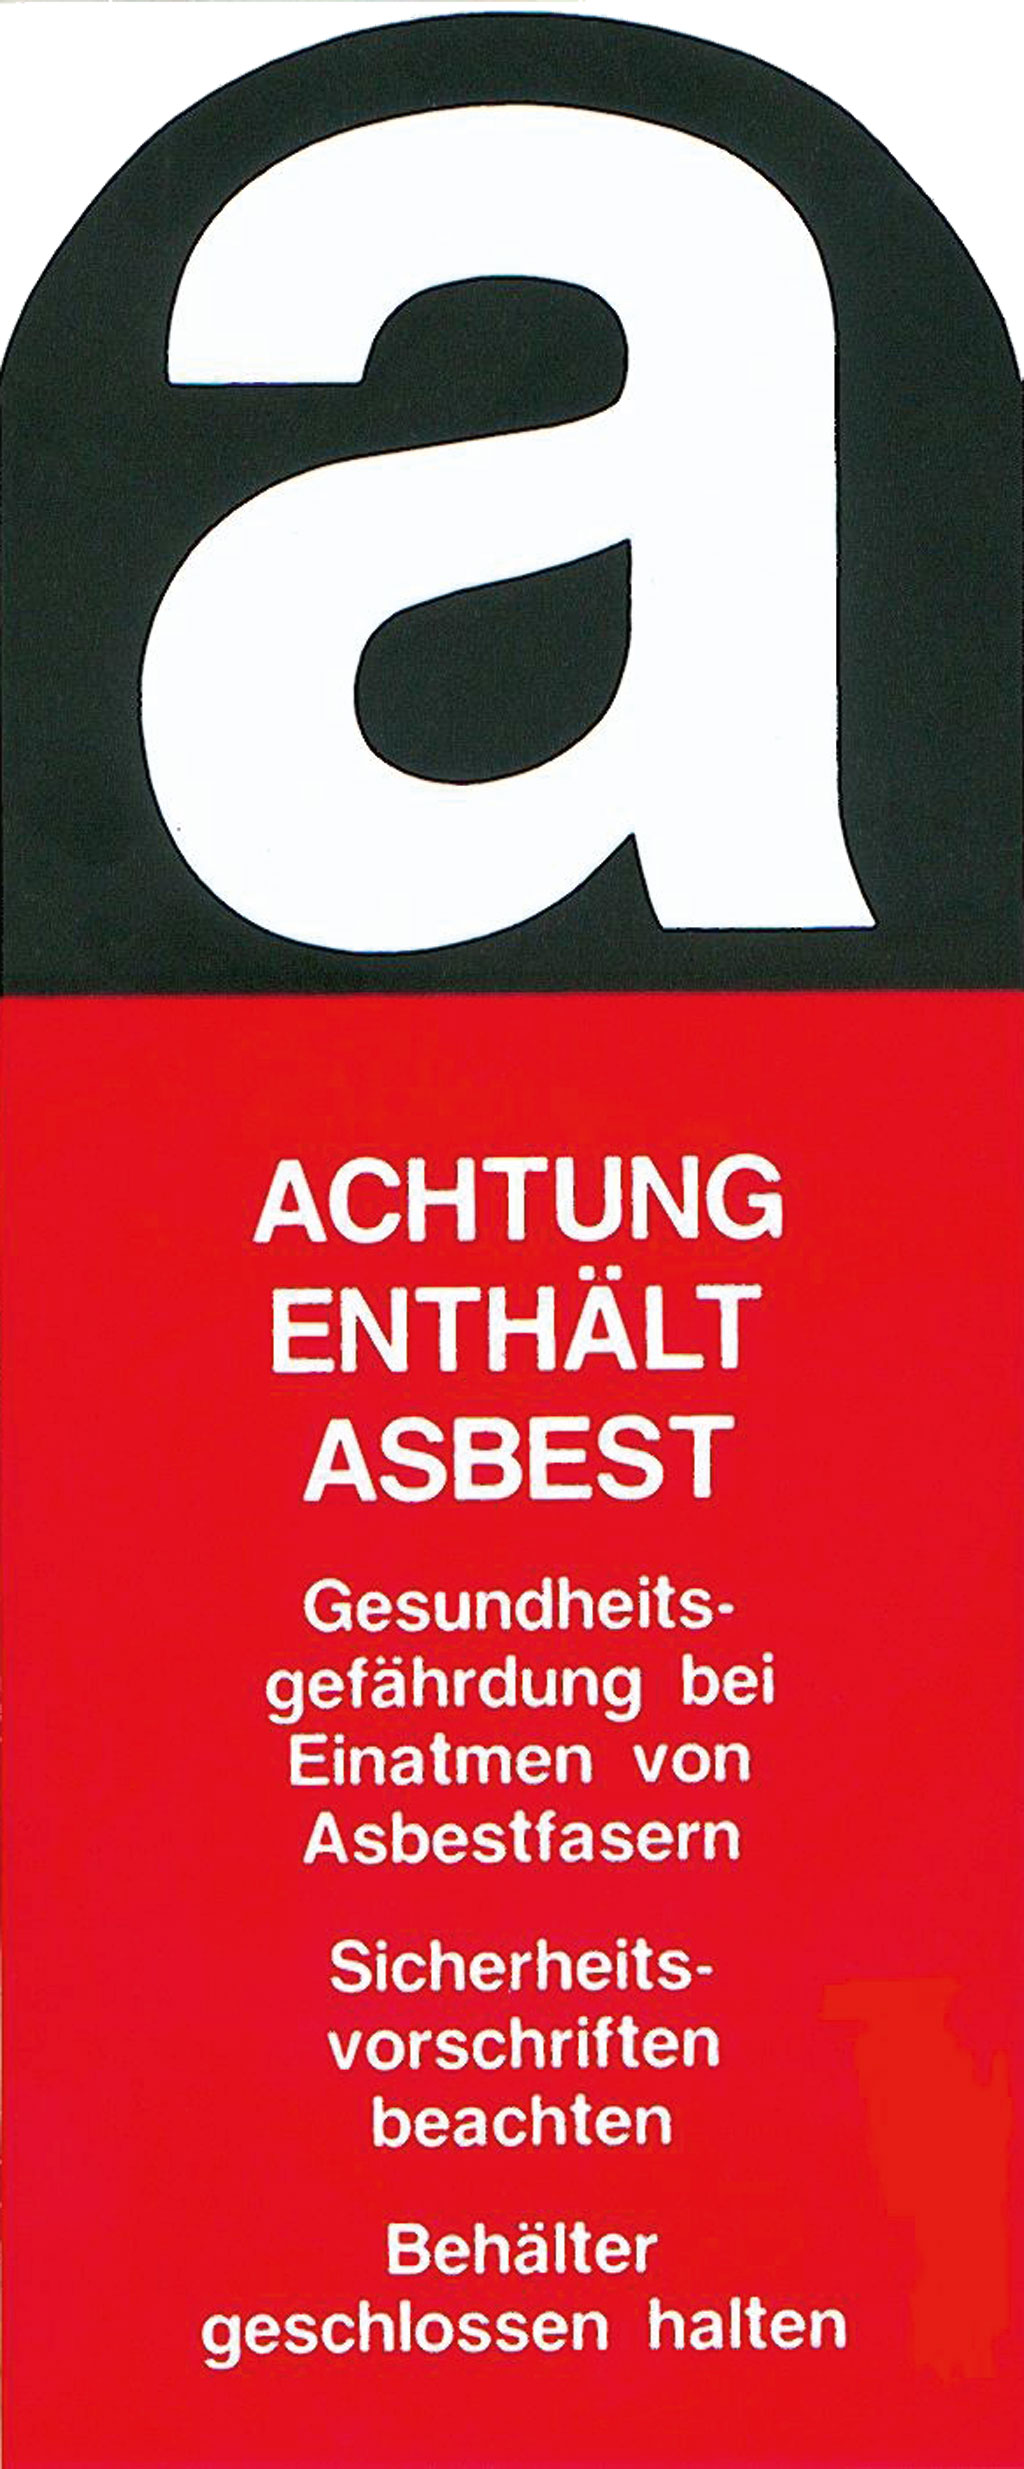 Ratgeber Asbest